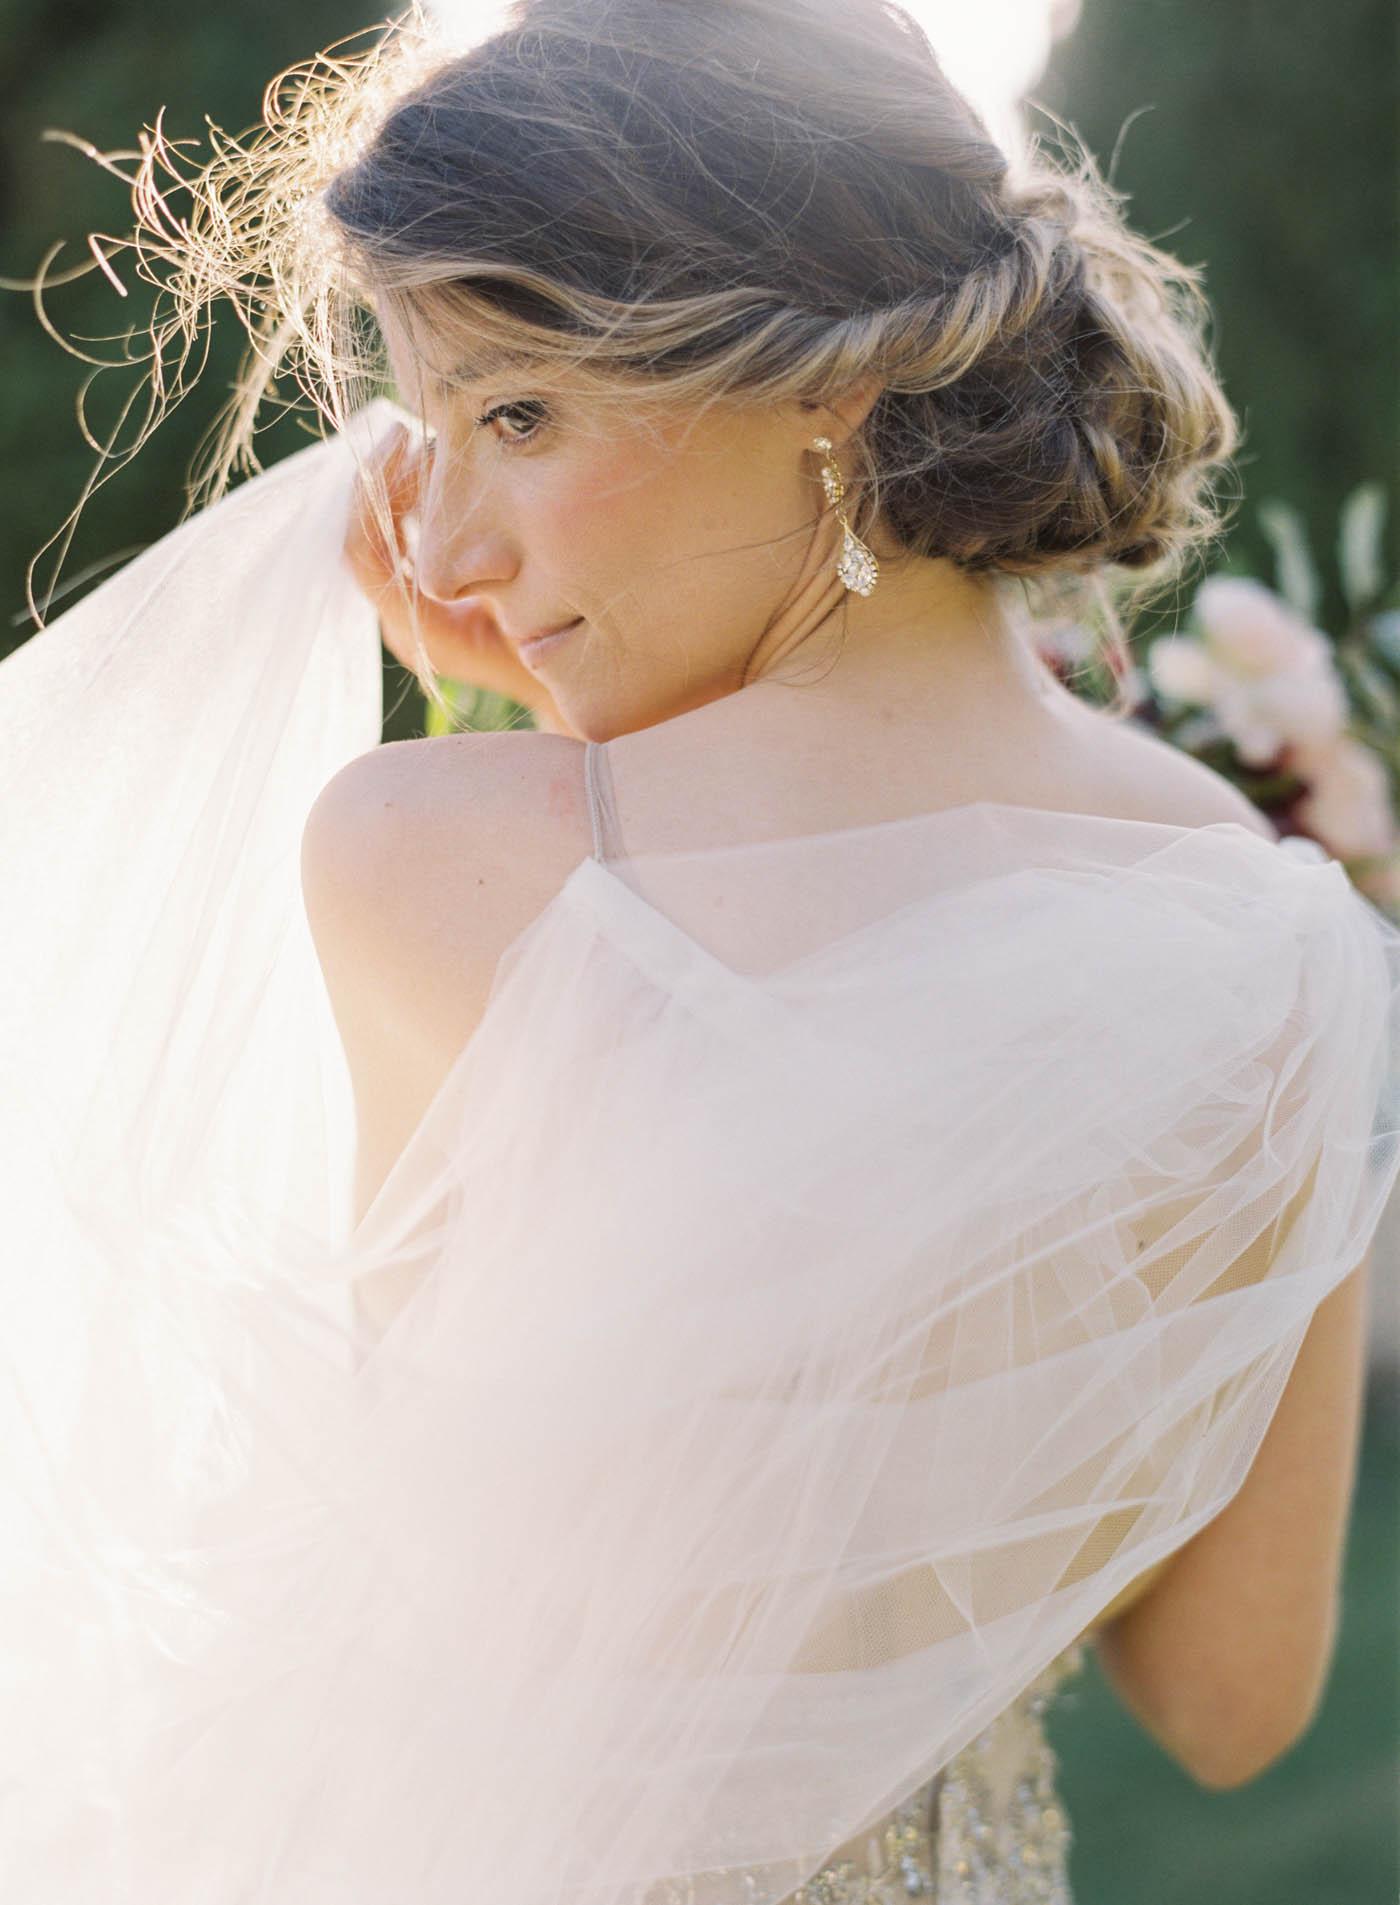 Villa_Cetinale_Wedding-41-Jen_Huang-ElanJacob-248-Jen_Huang-007305-R1-007.jpg